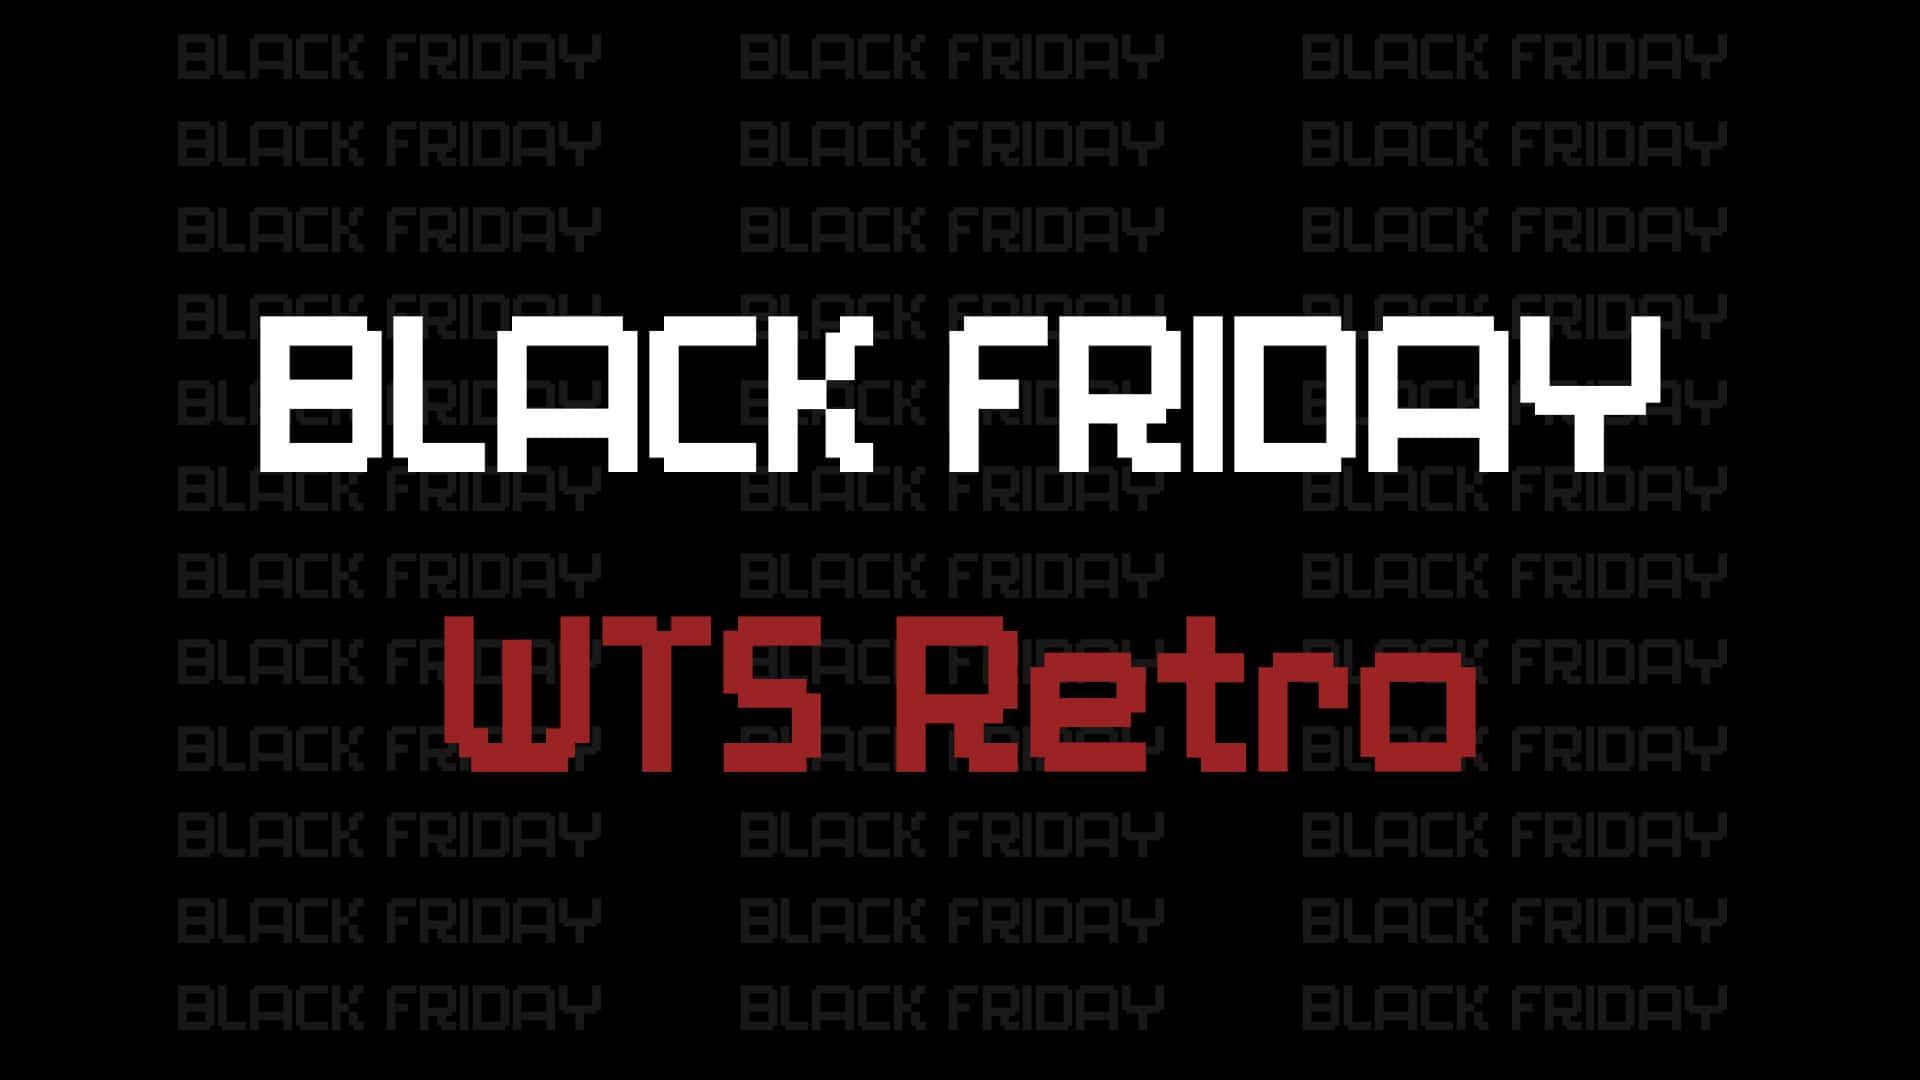 Black Friday hos WTS Retro 2020